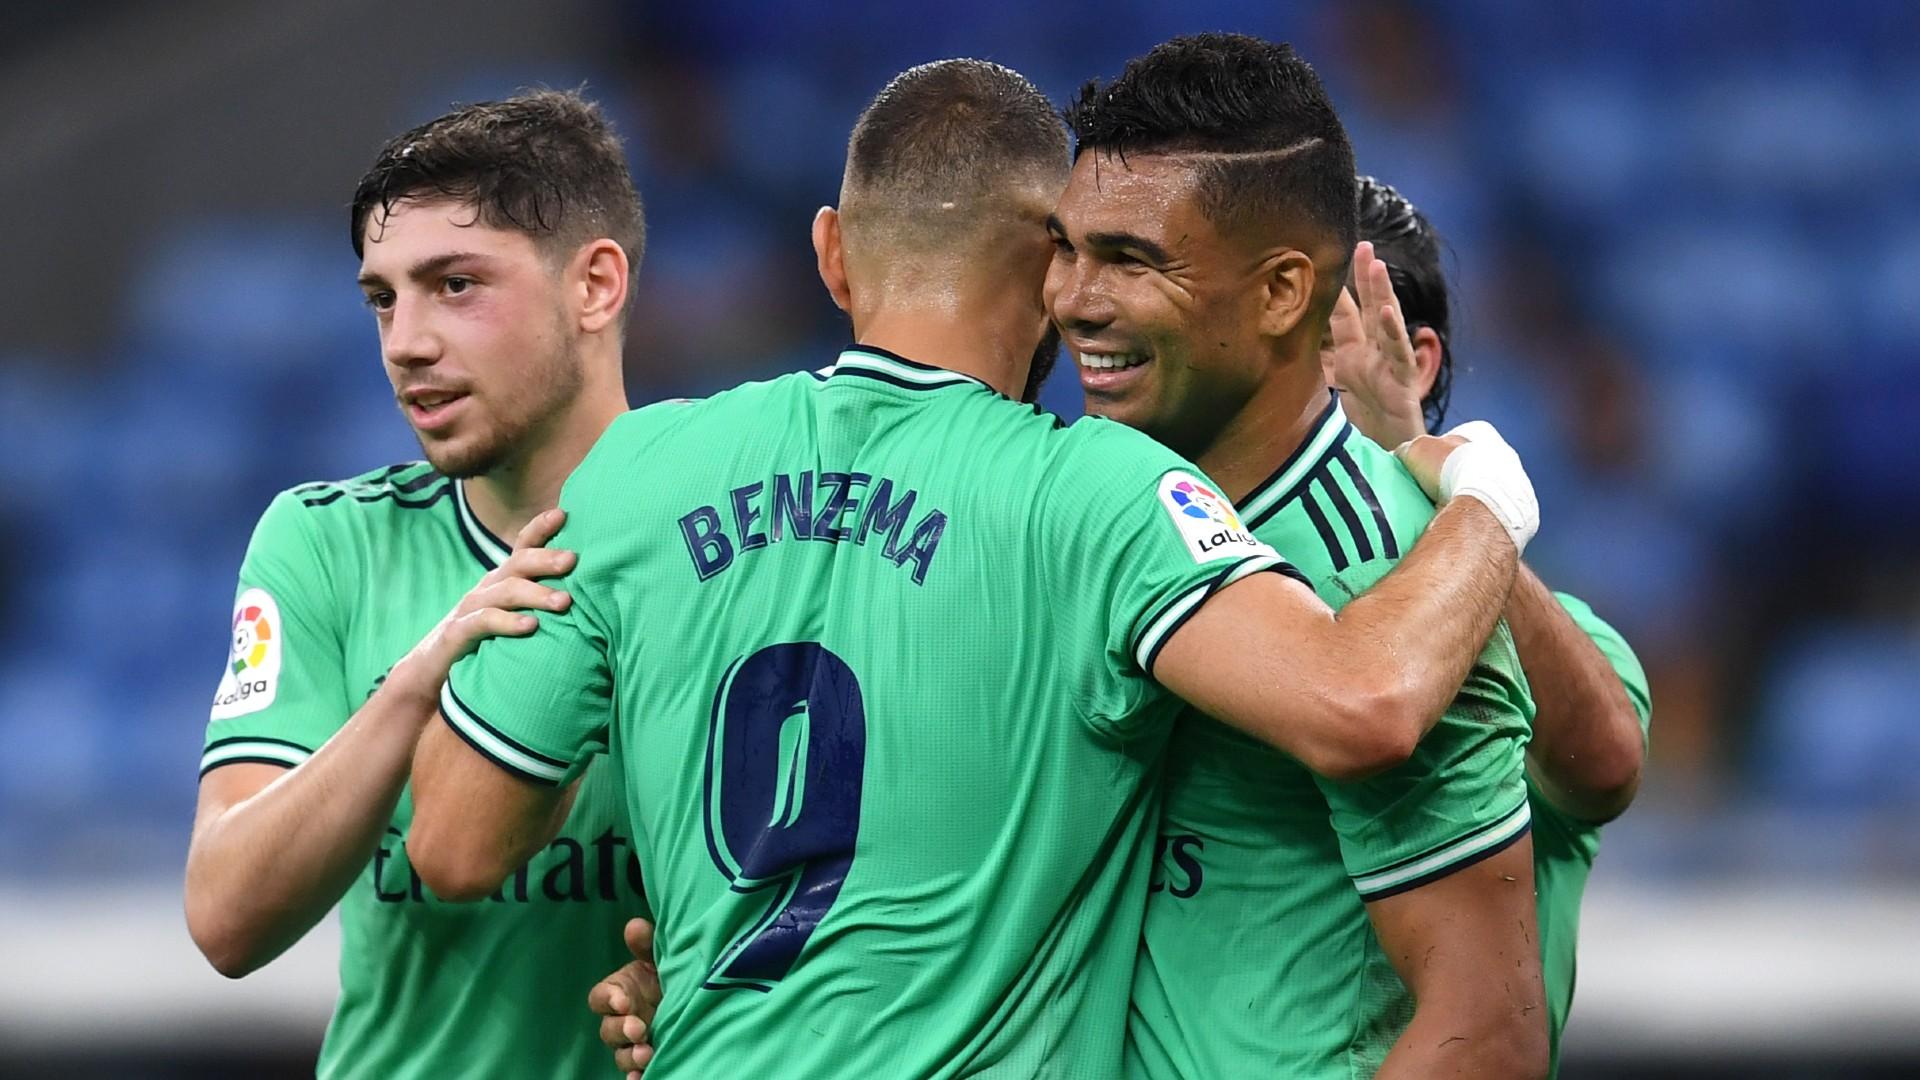 Espanyol - Real Madrid (0-1), Benzema inspire encore le Real